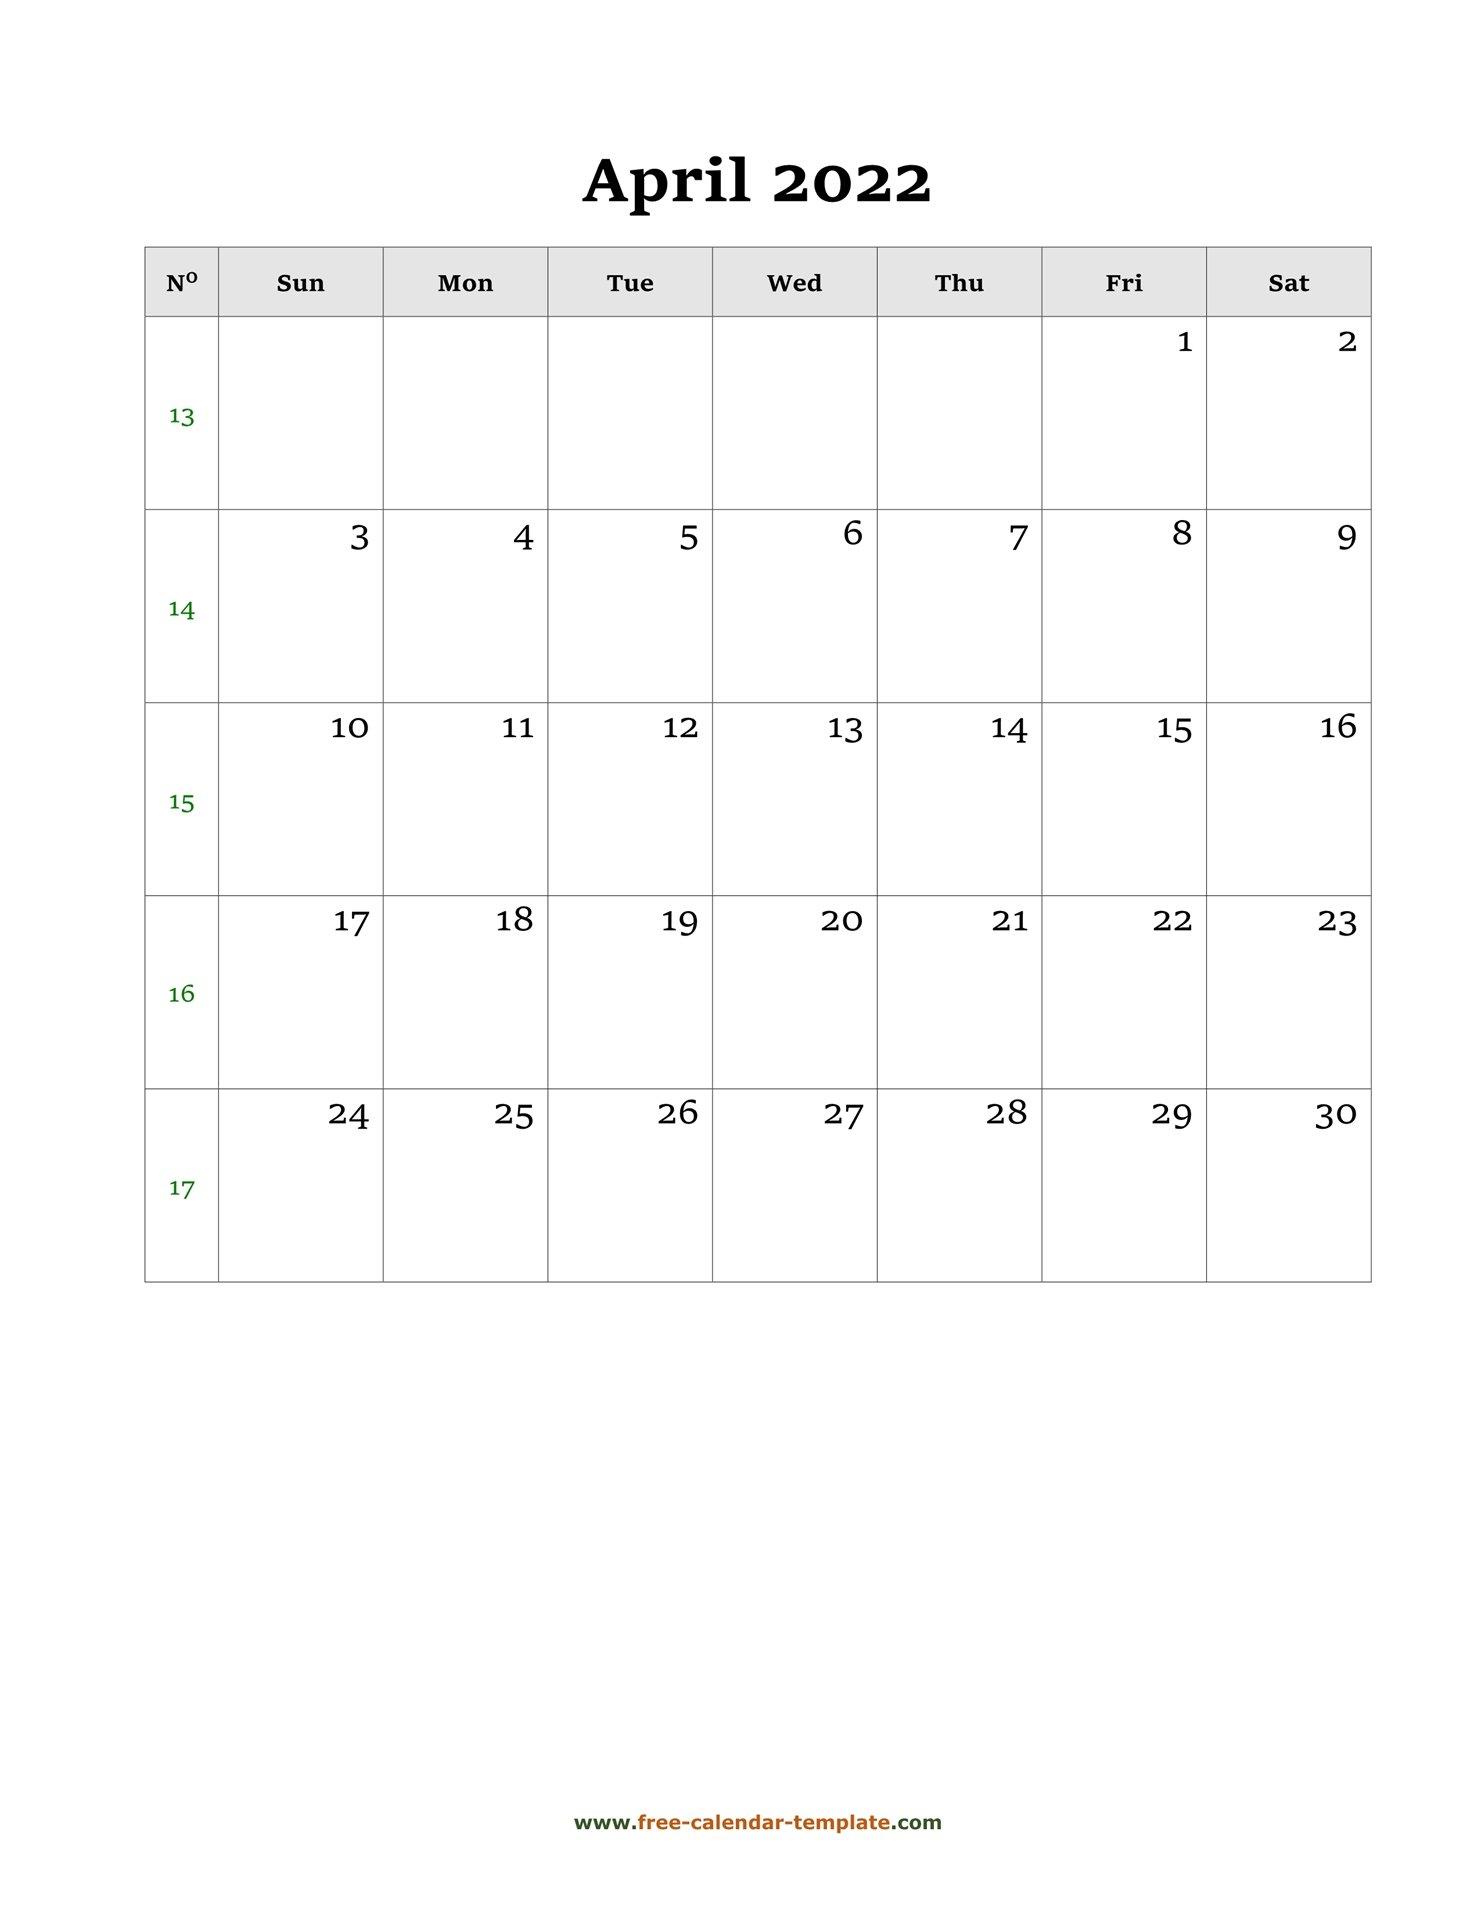 April Calendar 2022 Simple Design With Large Box On Each pertaining to Printable April 2022 Calendar